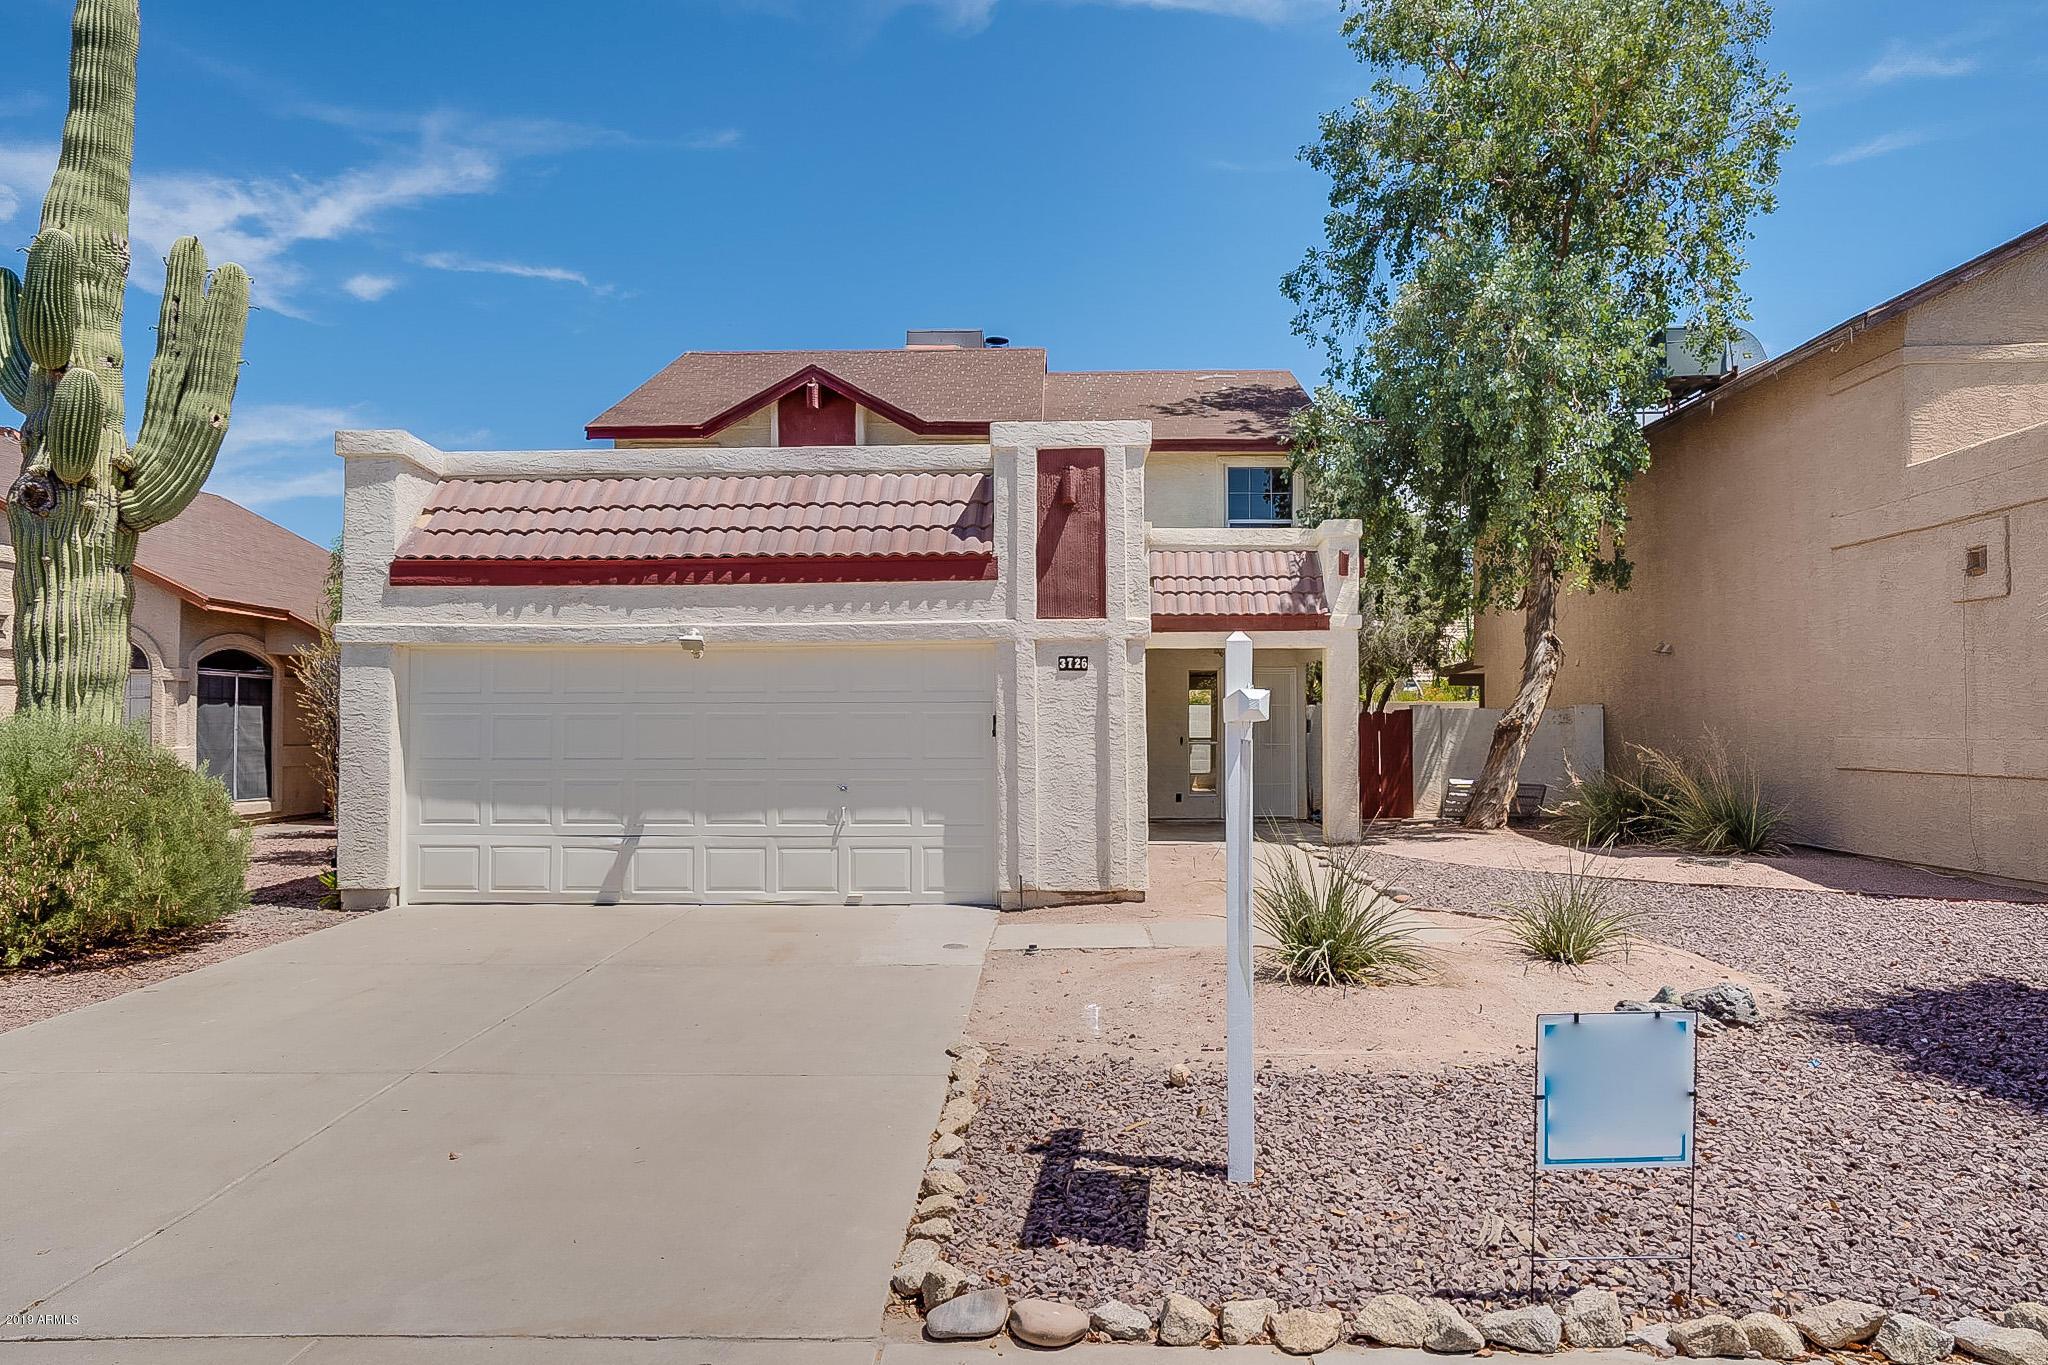 Photo of 3726 W IVANHOE Street, Chandler, AZ 85226